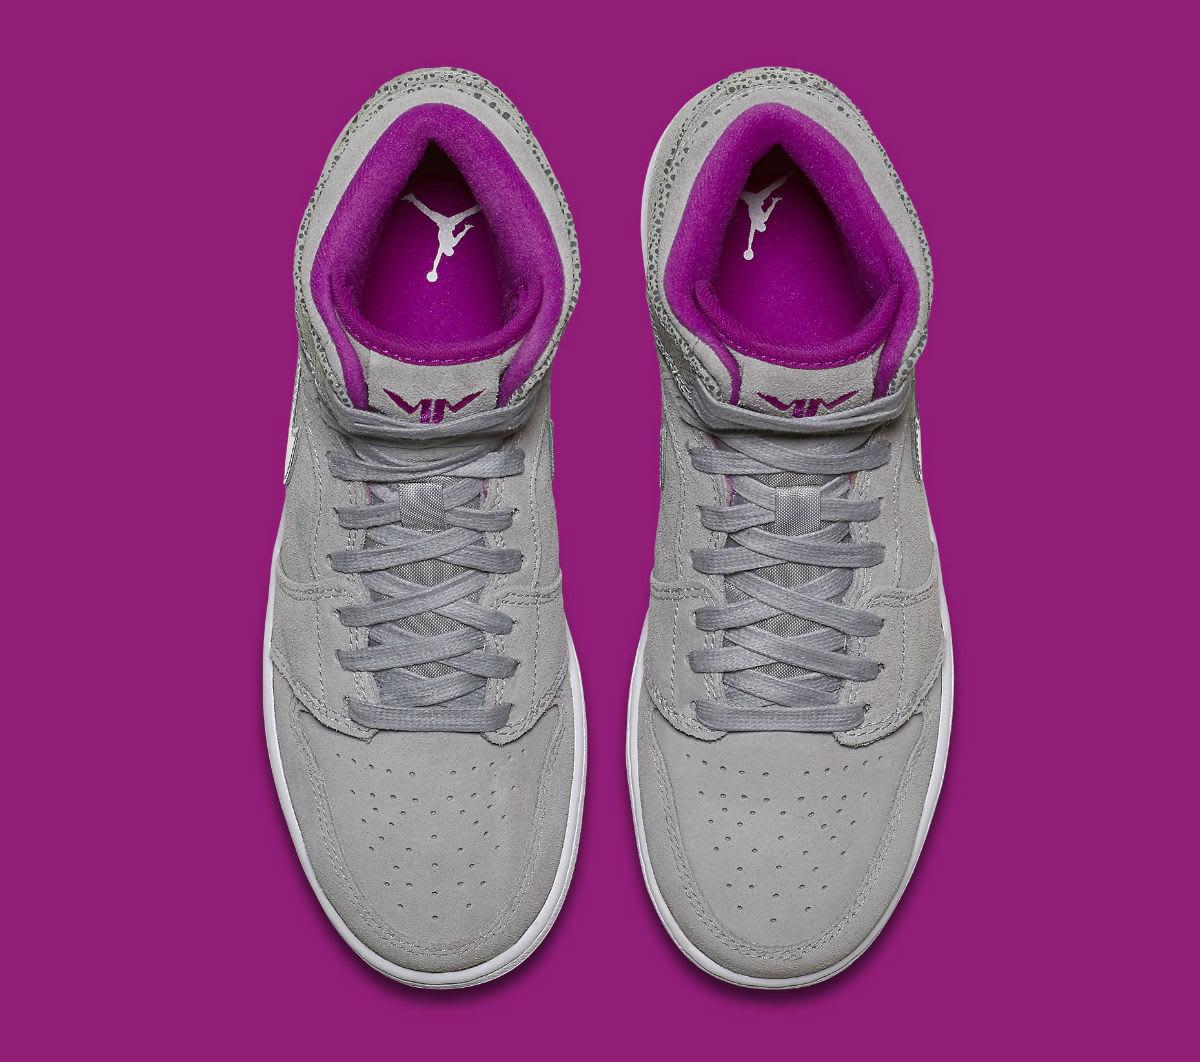 Air Jordan 1 Maya Moore Grey Silver Fuchsia Release Date Top 332148-012